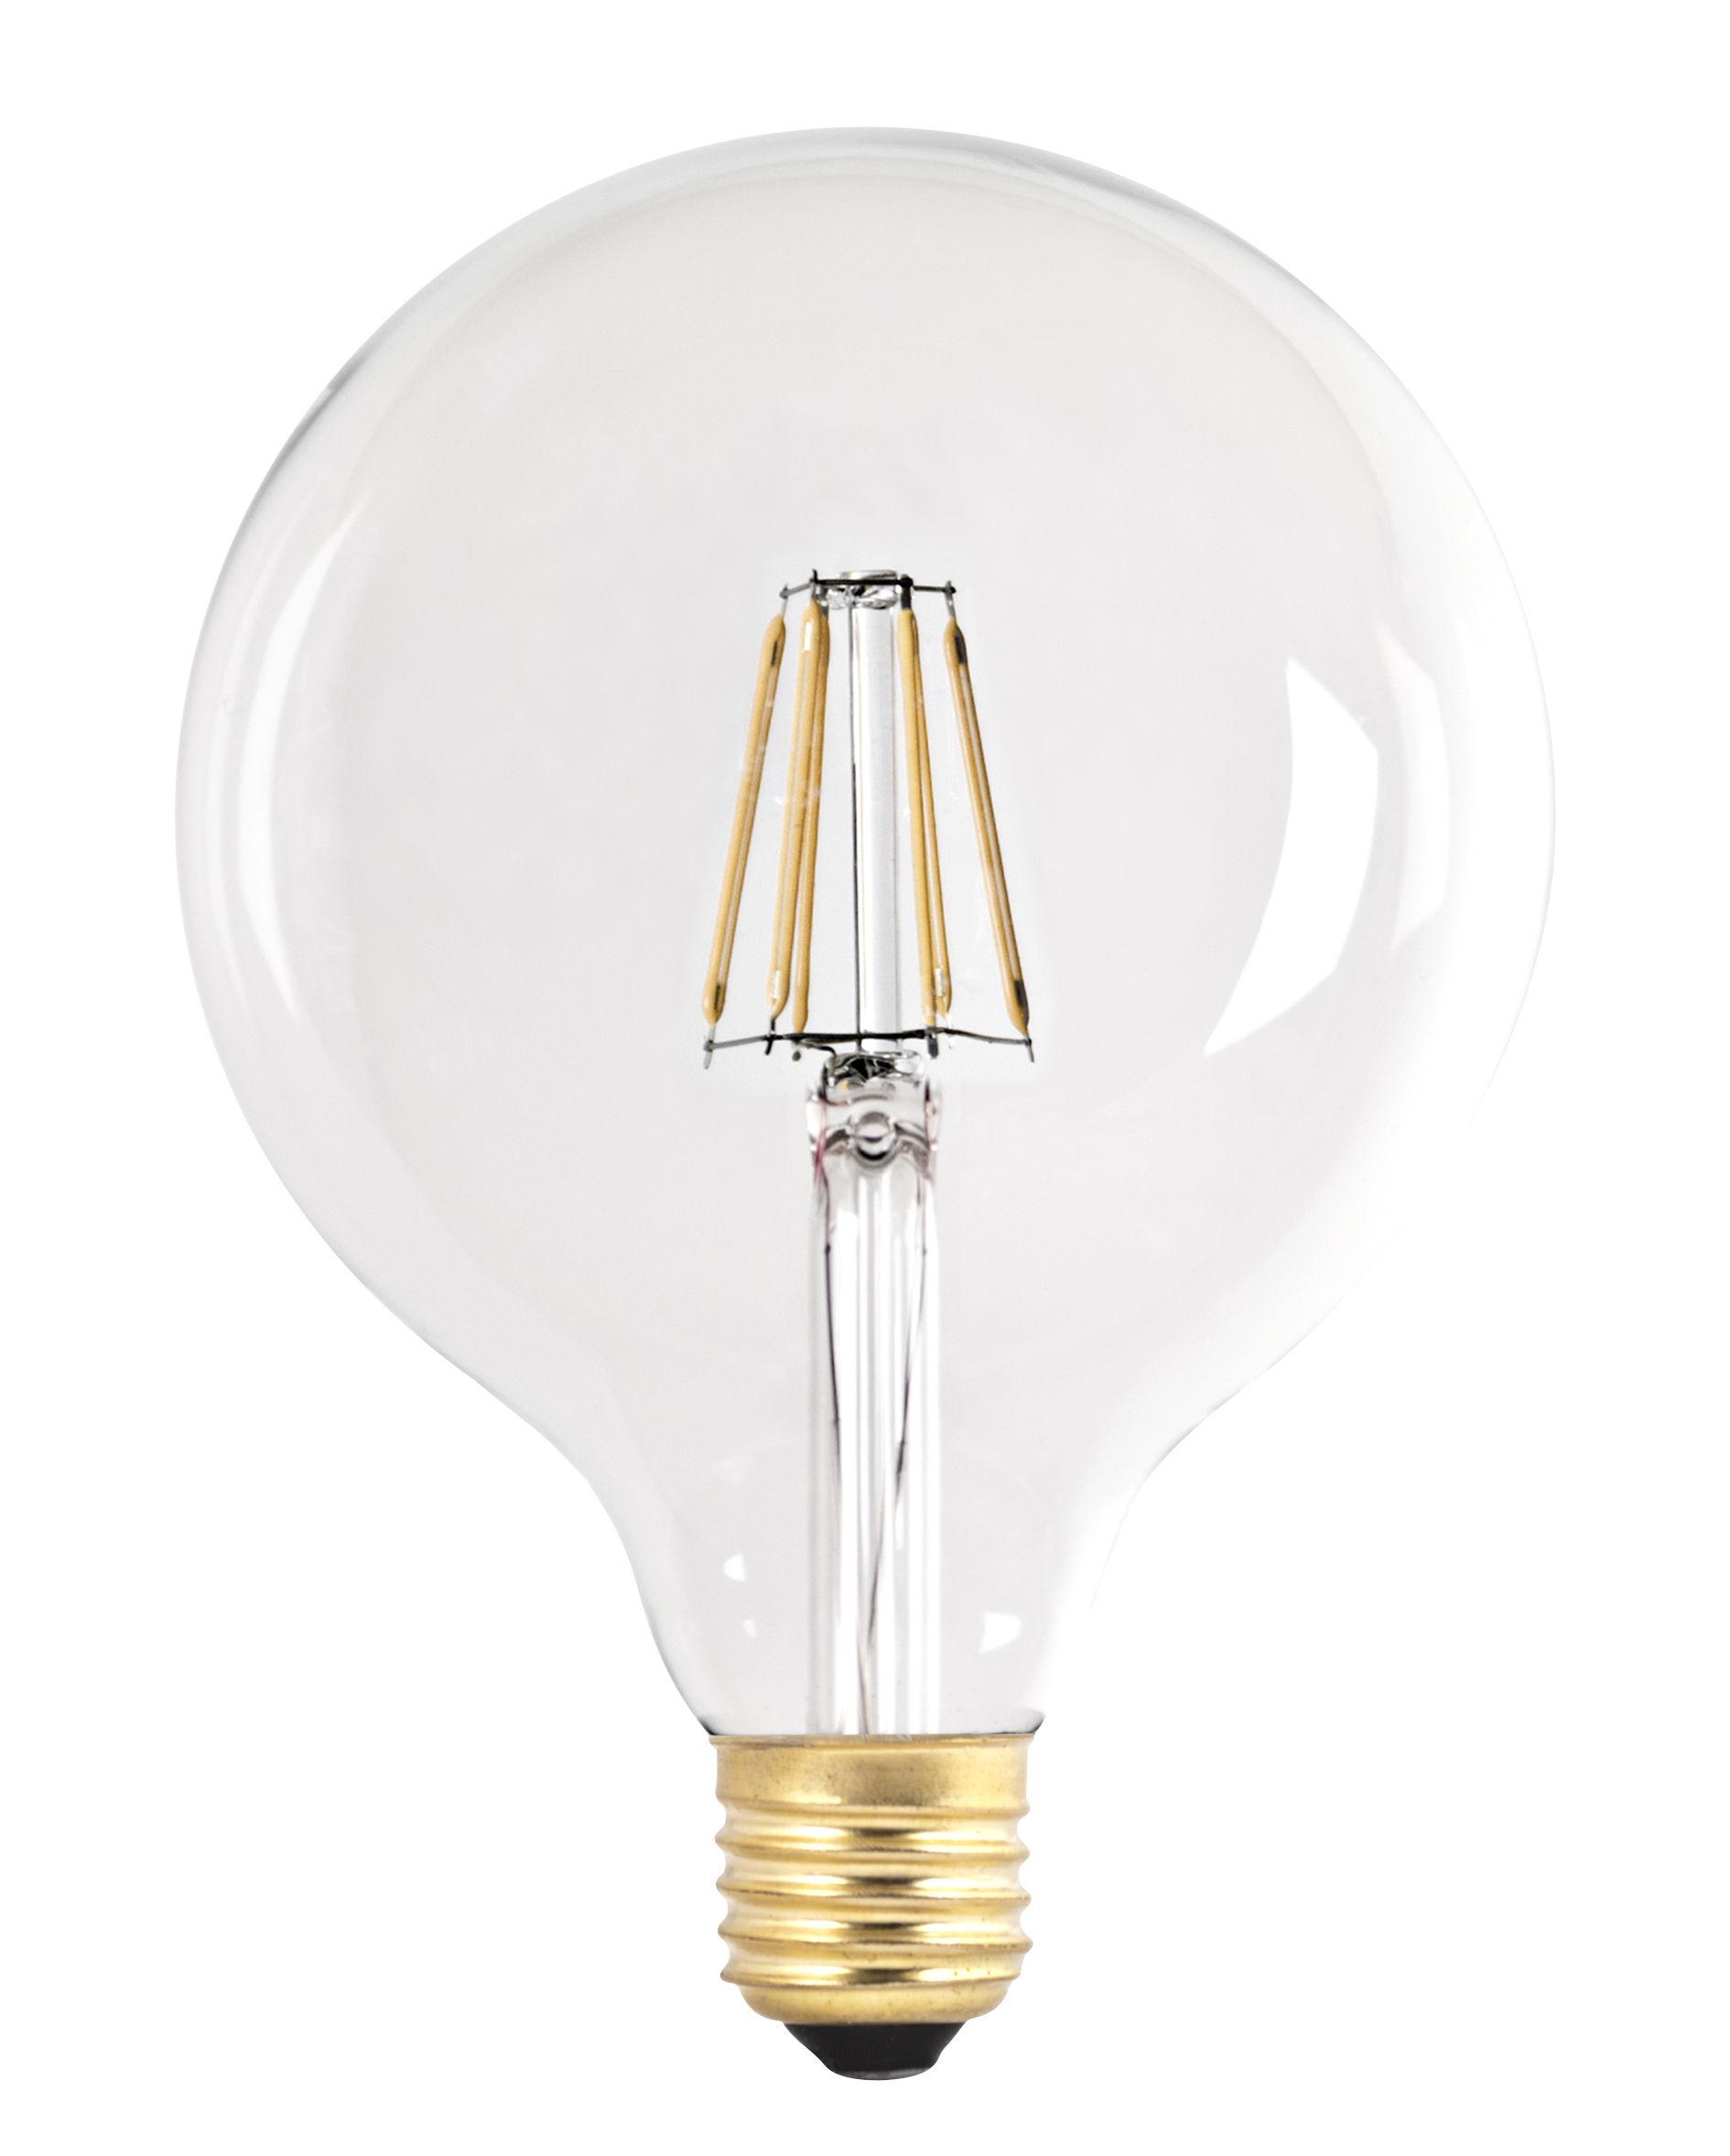 g125 ampoule led filaments e27 6w transparent gold by pop corn. Black Bedroom Furniture Sets. Home Design Ideas